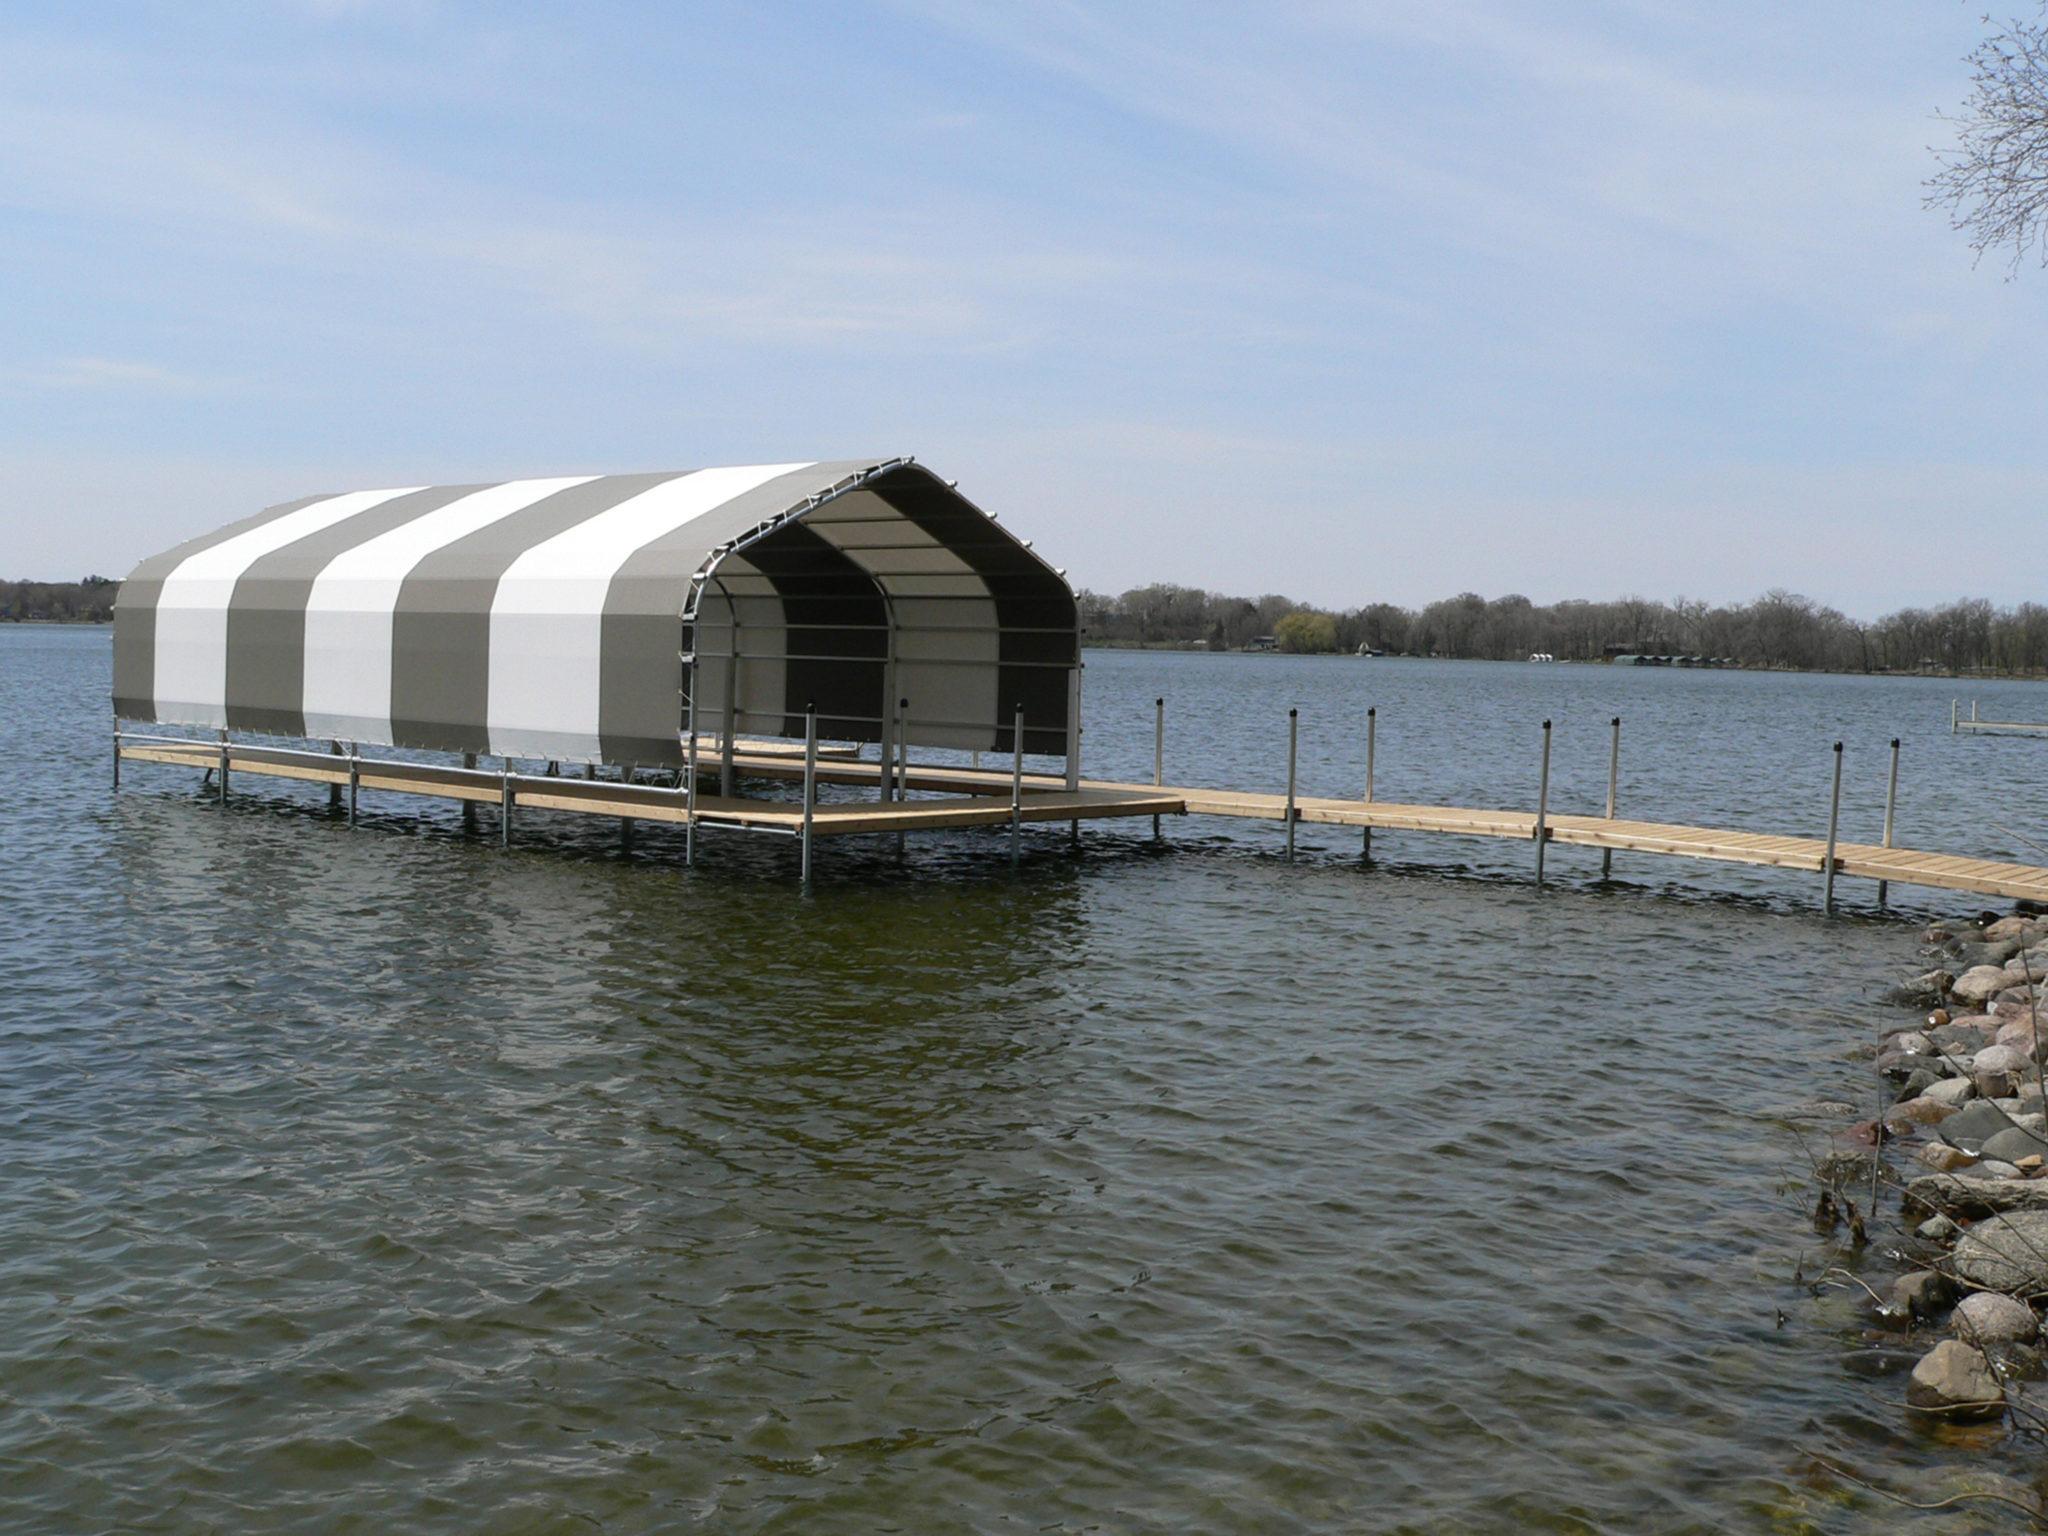 gray and white striped boathouse on lake Minnetonka